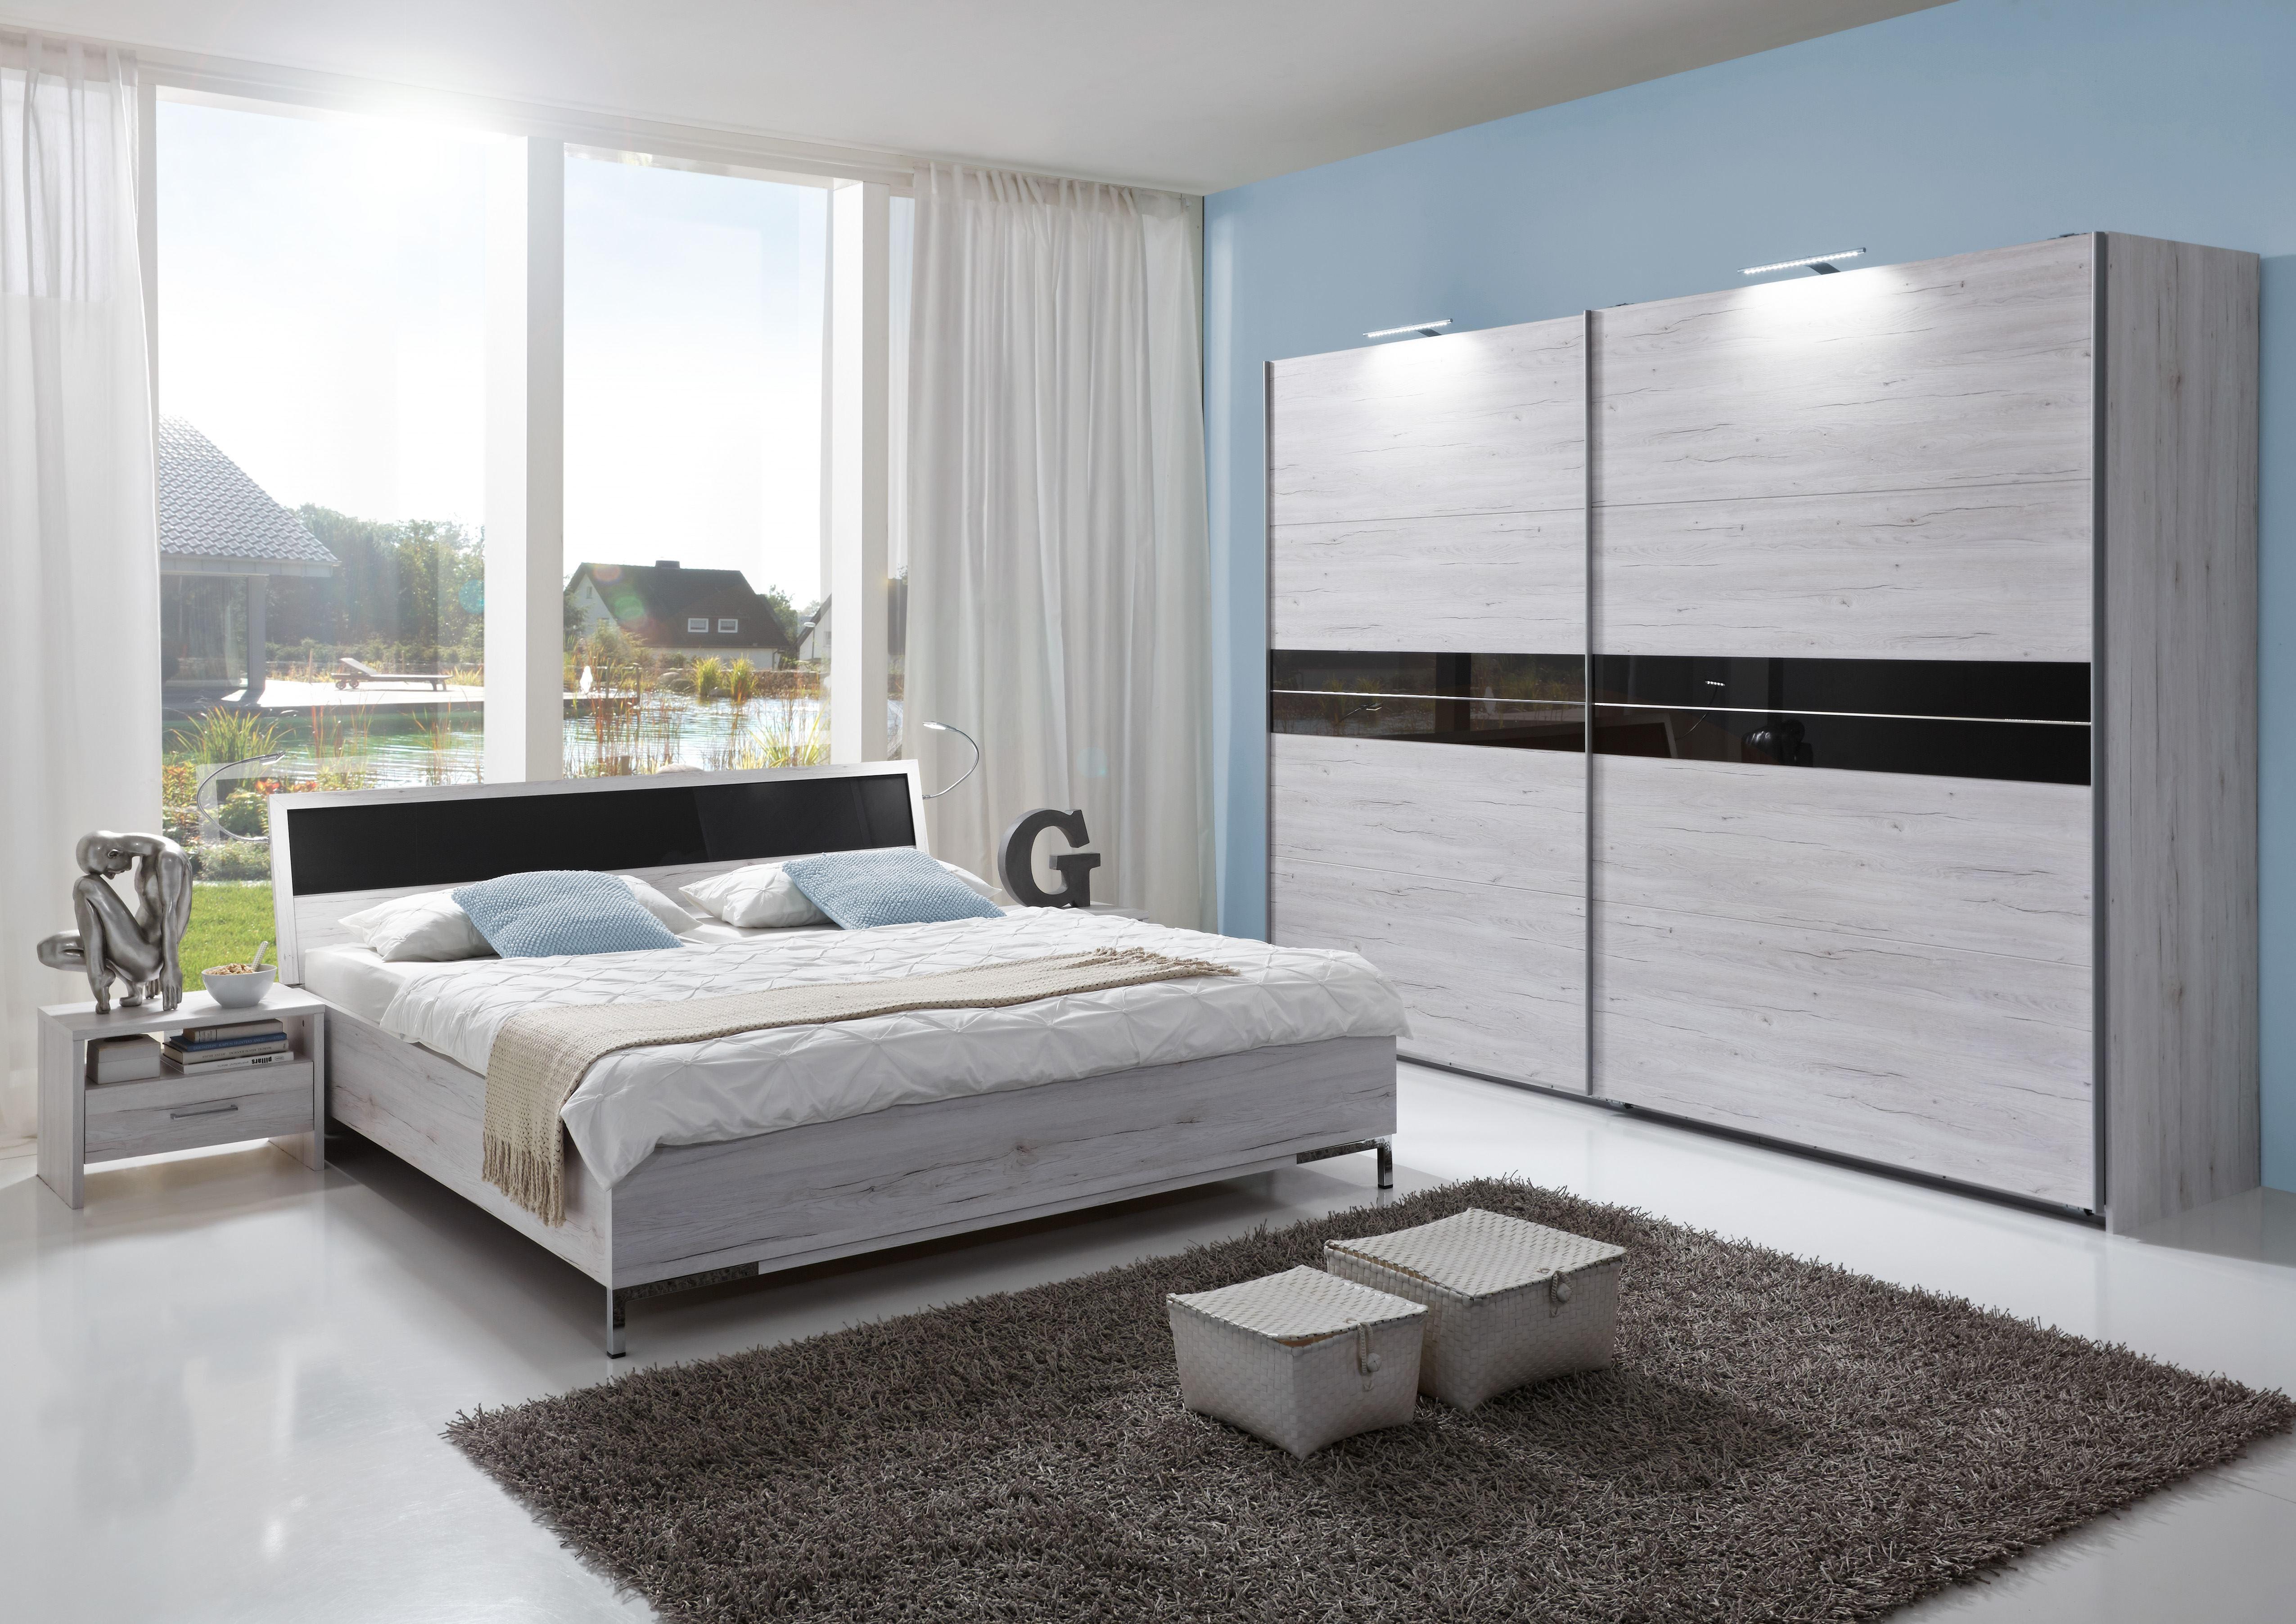 Schlafzimmer-Set Komplett ACAPULCO Doppelbett NAKO